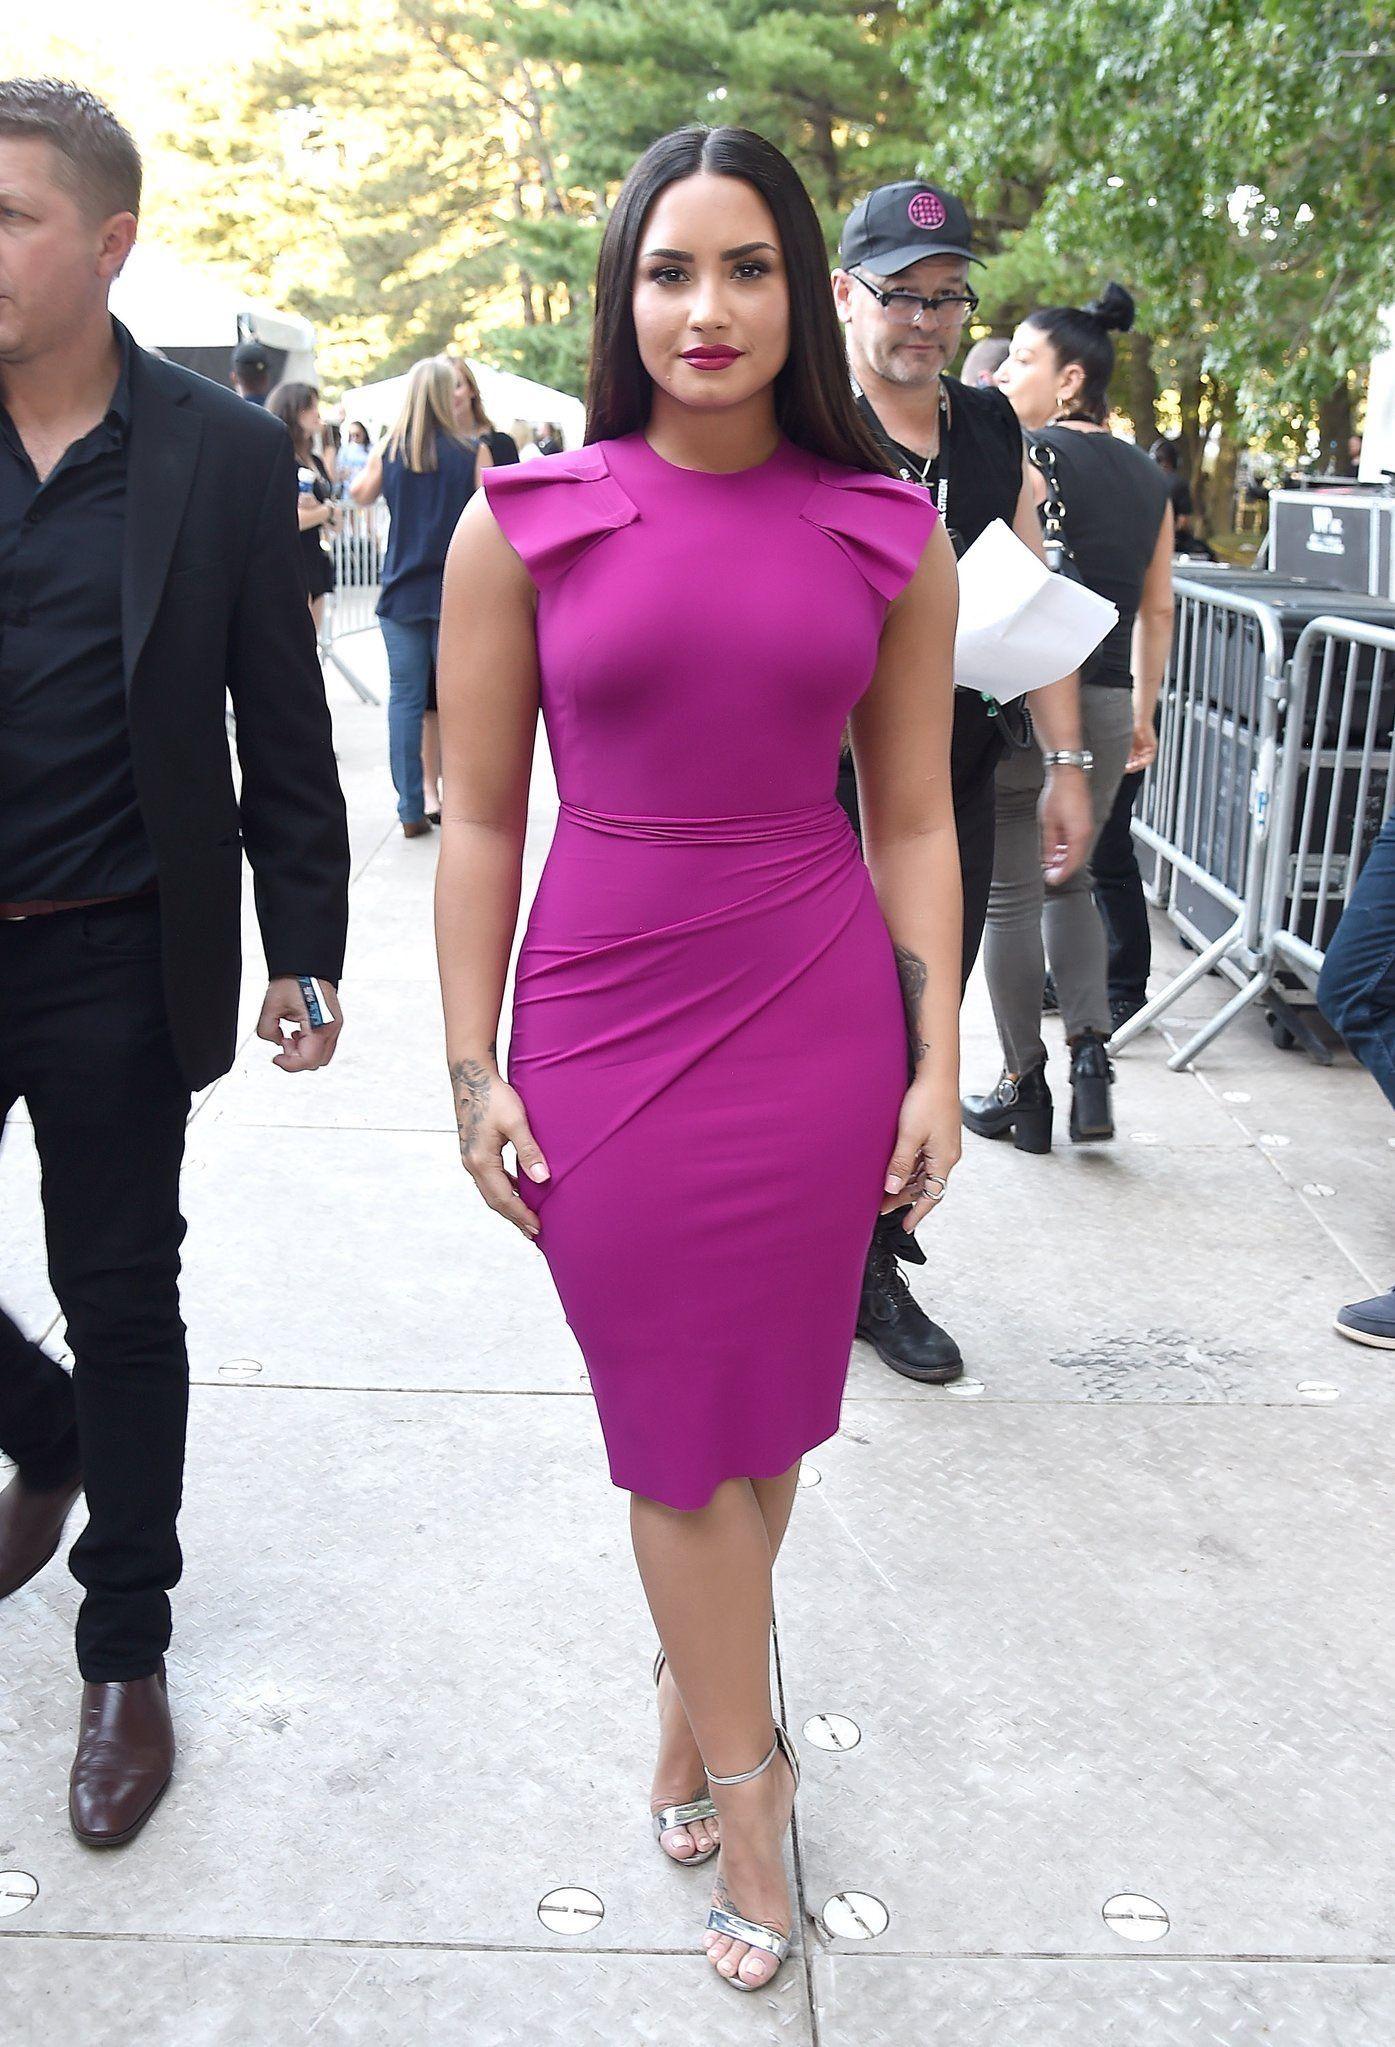 Pin de Victoria Smith en Demi Lovato | Pinterest | Vestido elegante ...